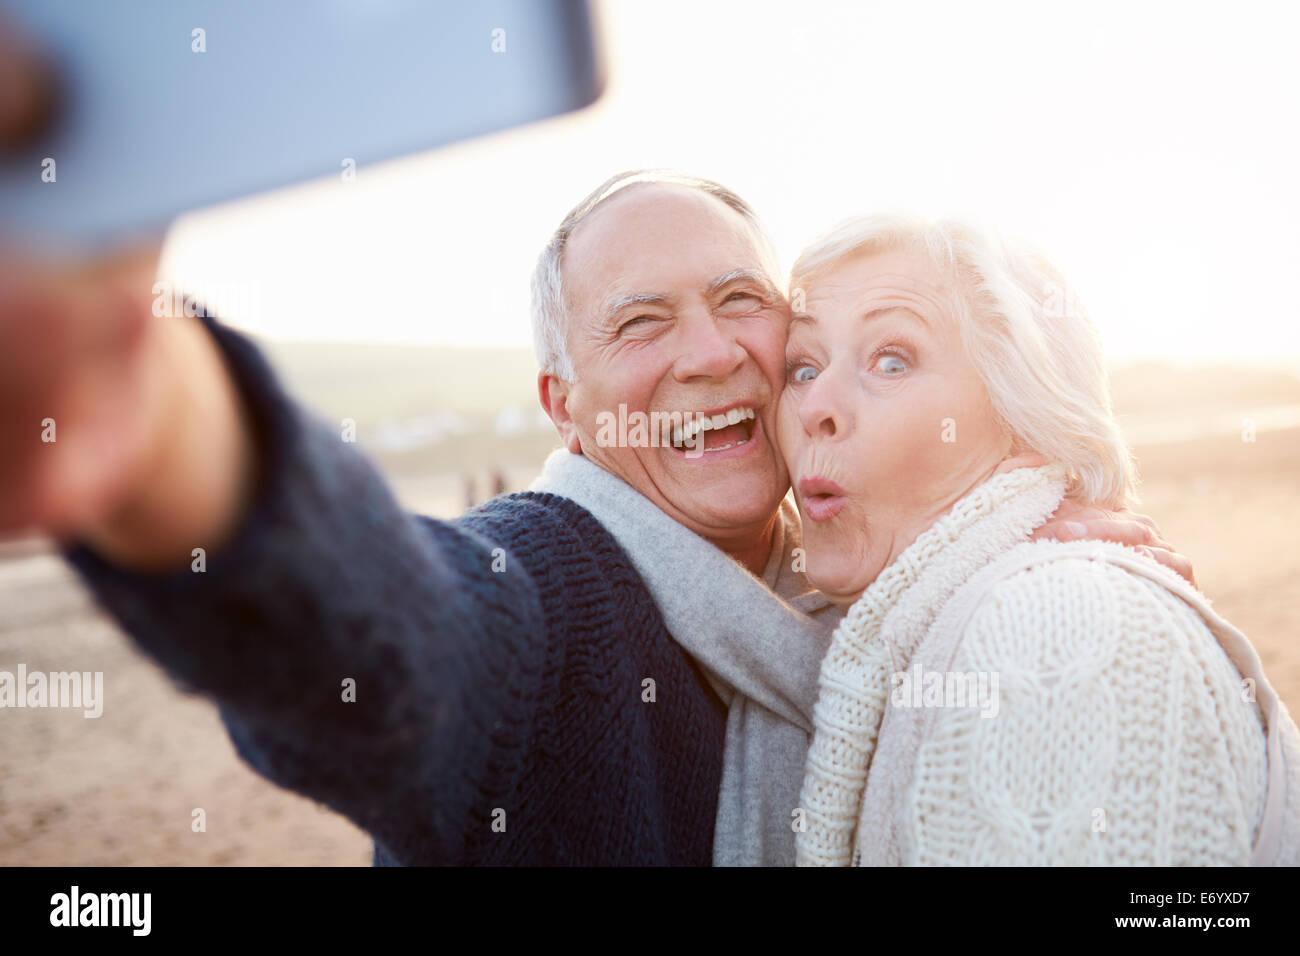 Pareja senior en la playa tomando Selfie permanente Imagen De Stock